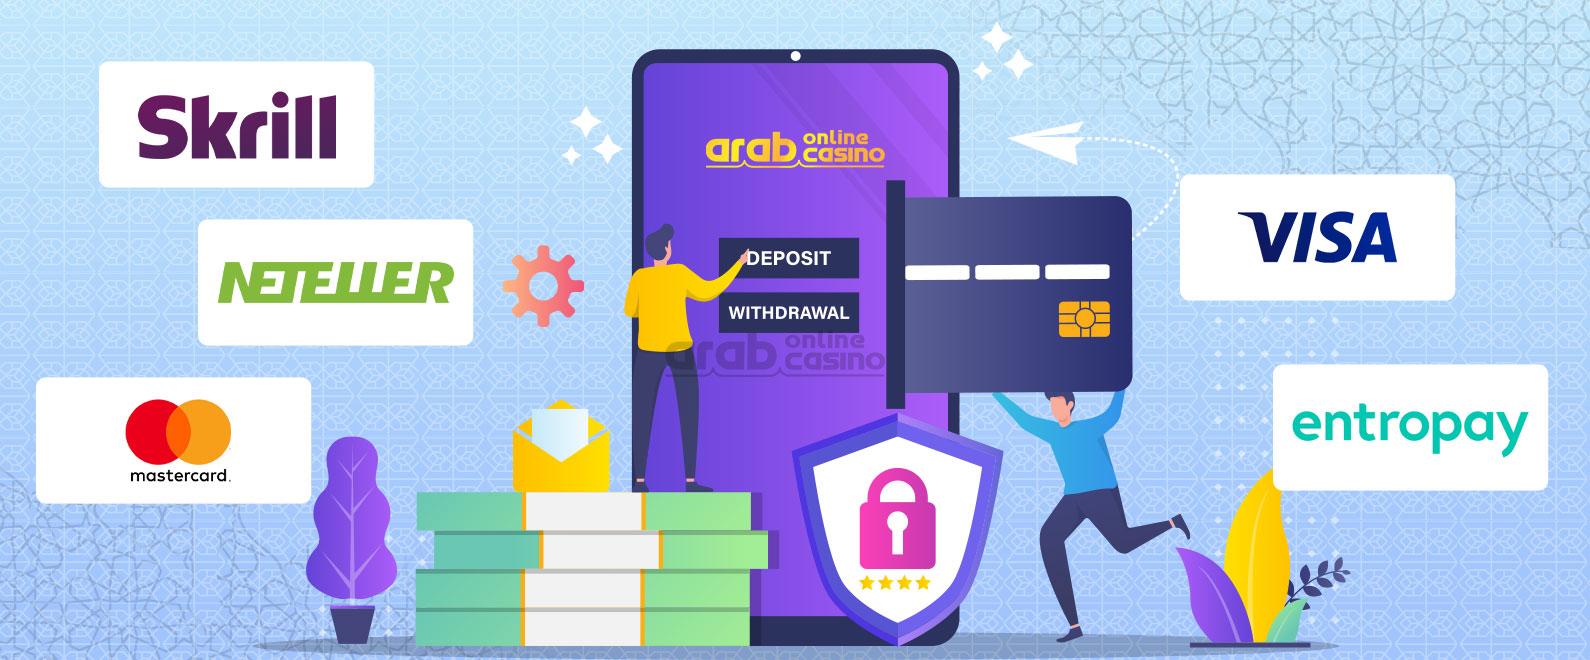 online casino bahrain